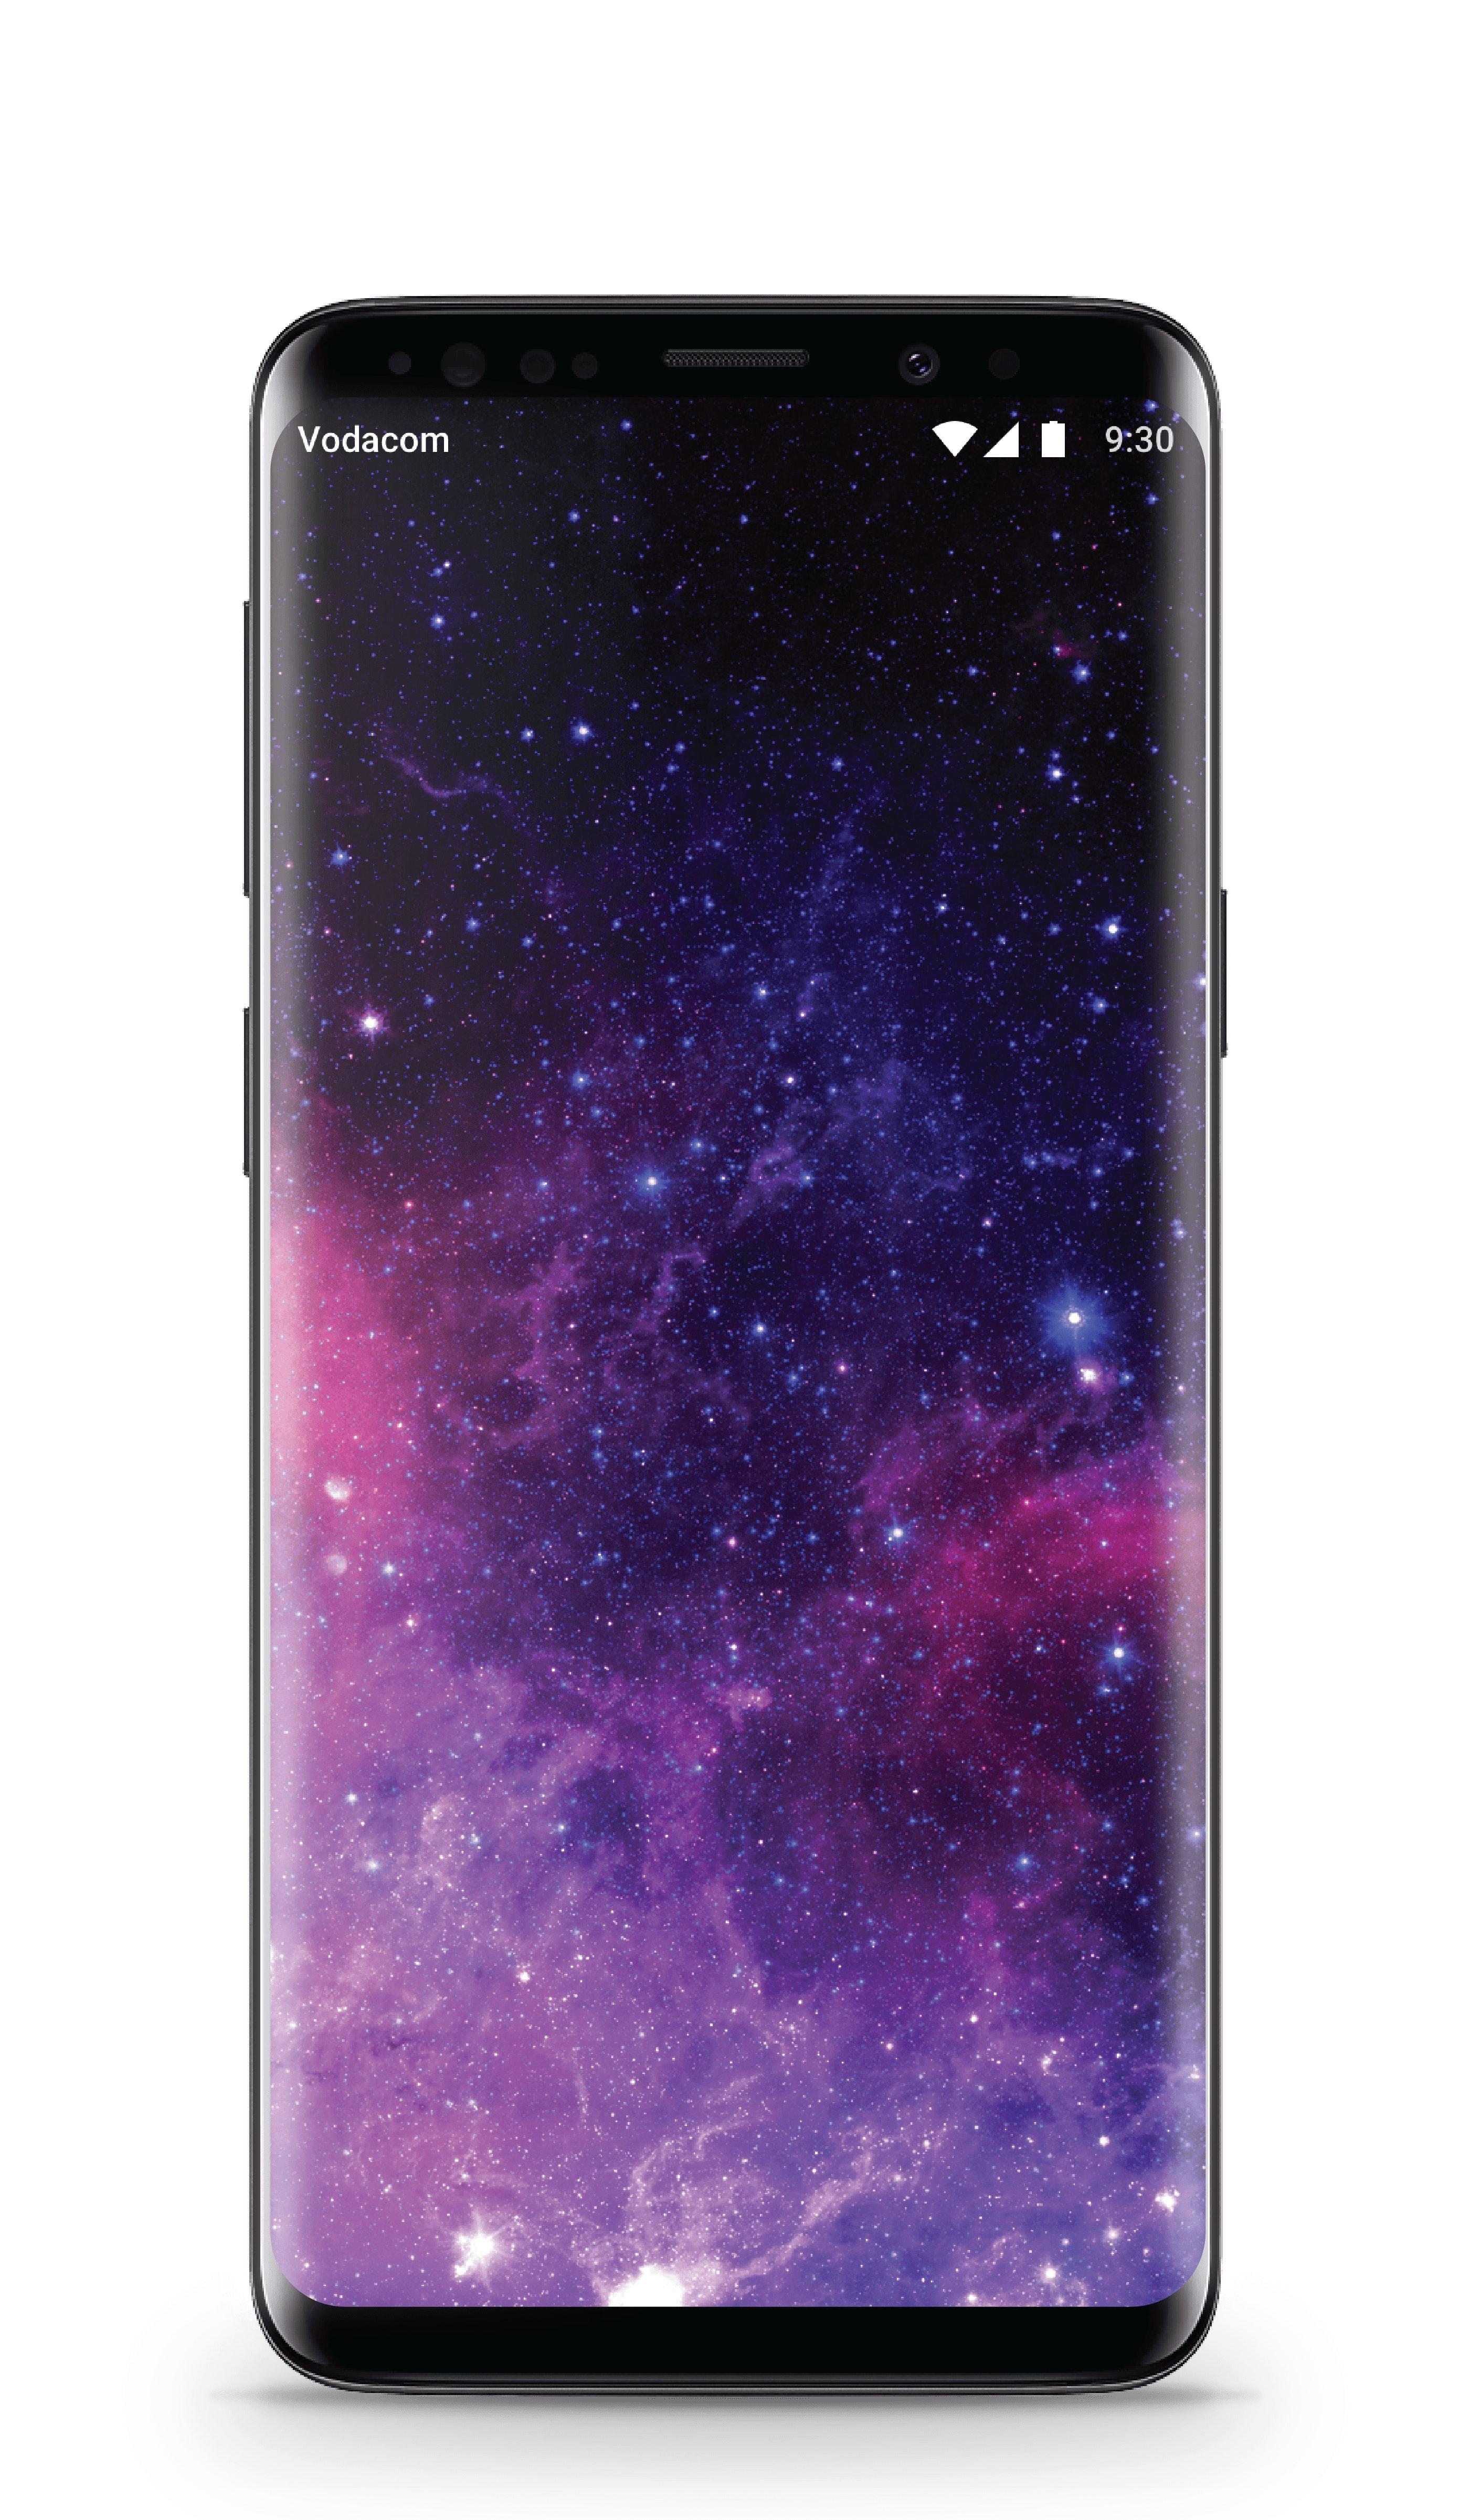 Samsung Galaxy S9 image